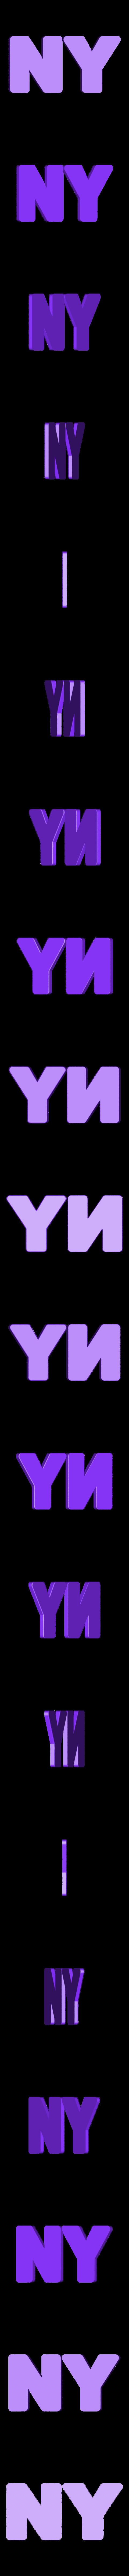 letters_translu.OBJ Download free OBJ file NYC- New York Letters • 3D printable template, Nairobiguy3D